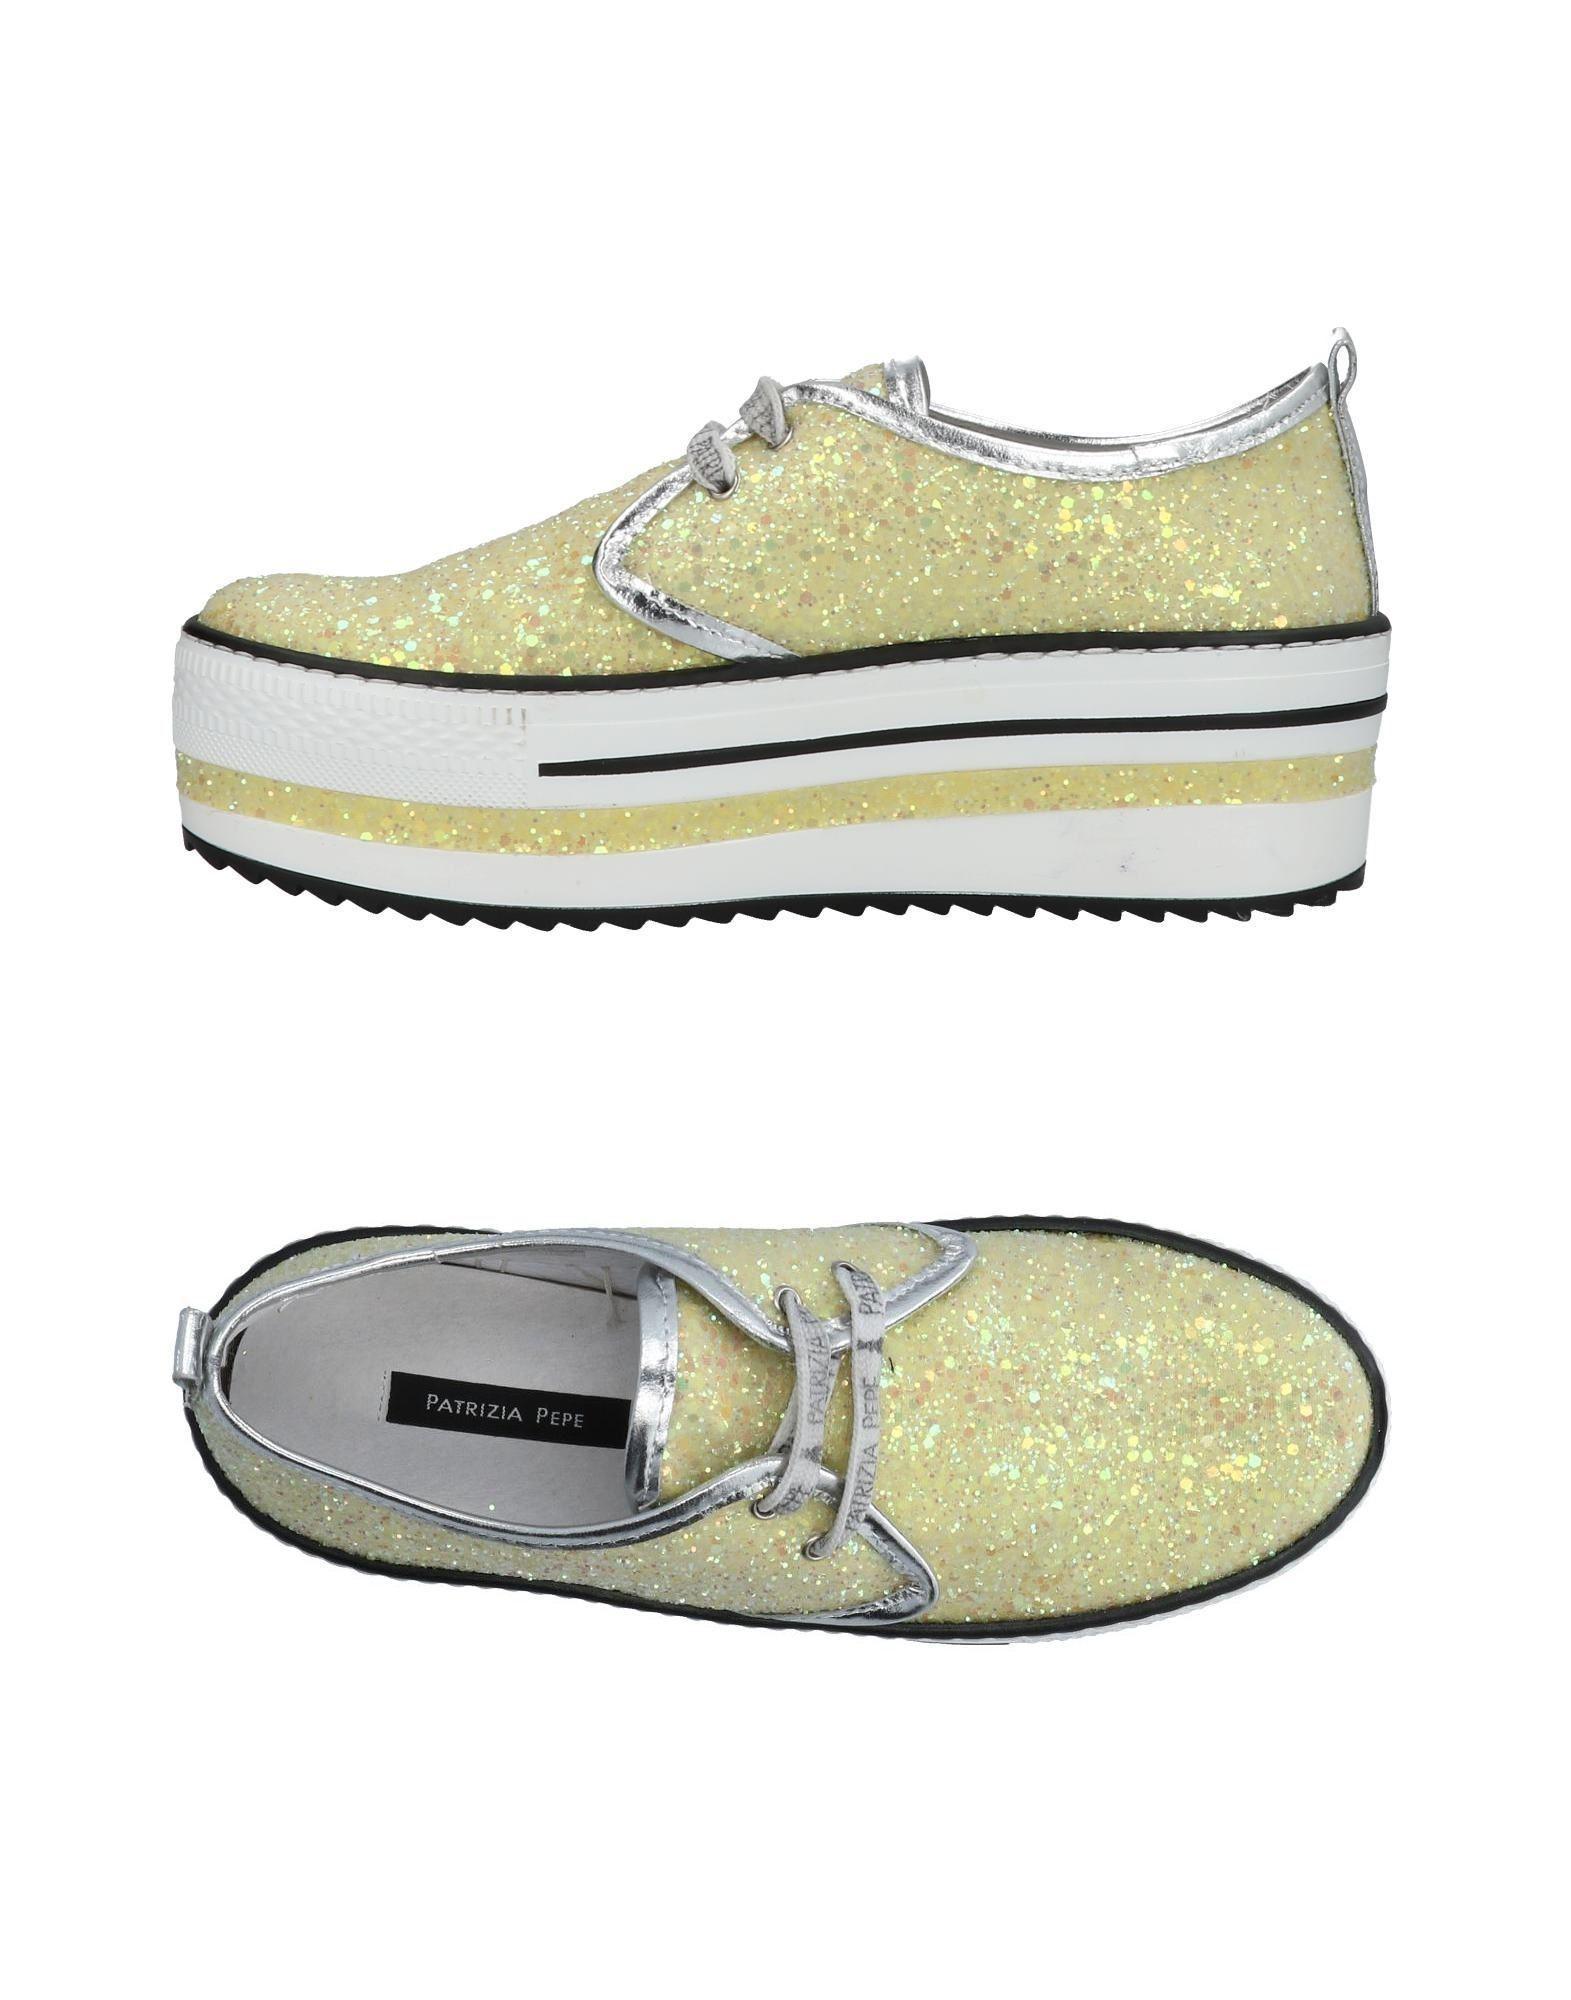 FOOTWEAR - Low-tops & sneakers Patrizia Pepe zH5rXzx